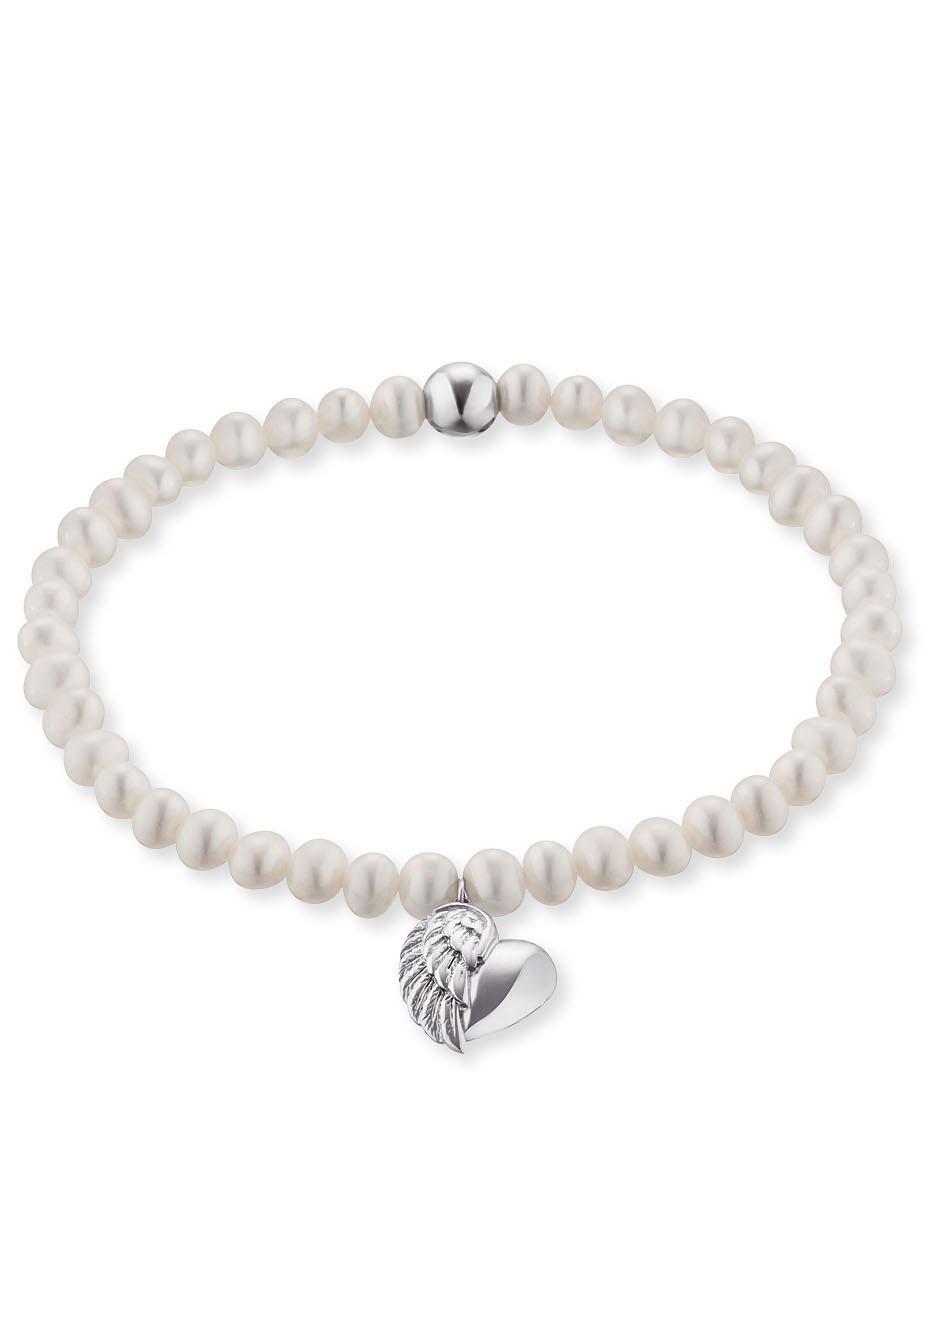 Engelsrufer Perlenarmband HERZFLÜGEL CHARM ERB-HEARTWING-PE | Schmuck > Armbänder > Perlenarmbänder | Weiß | Engelsrufer